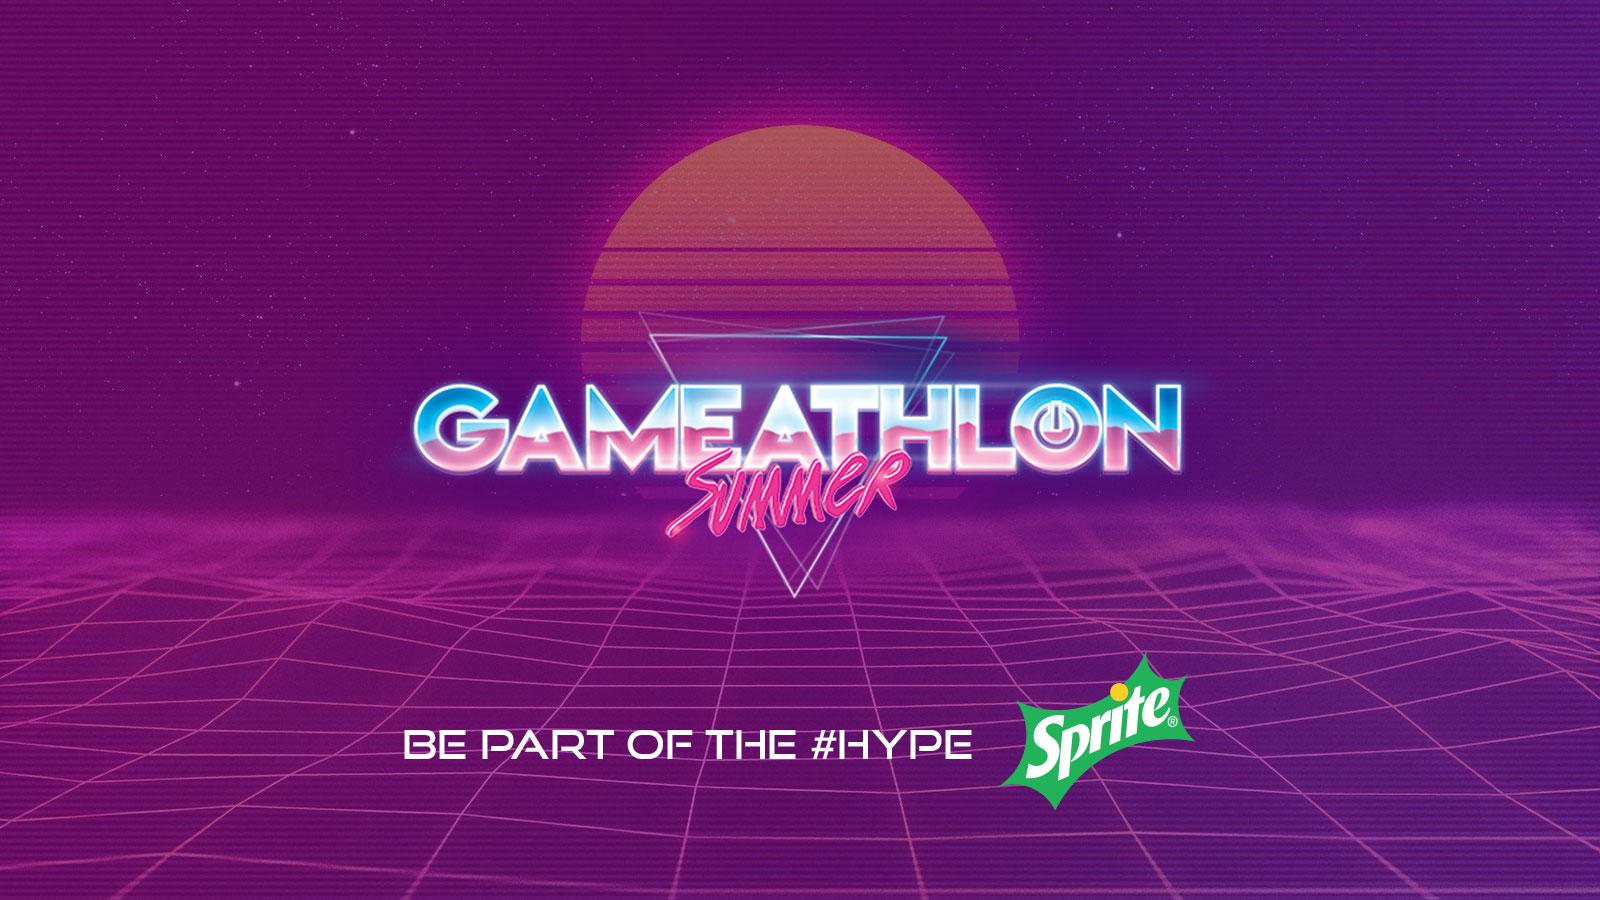 share_image_2019_gameathlon_summer_sprite